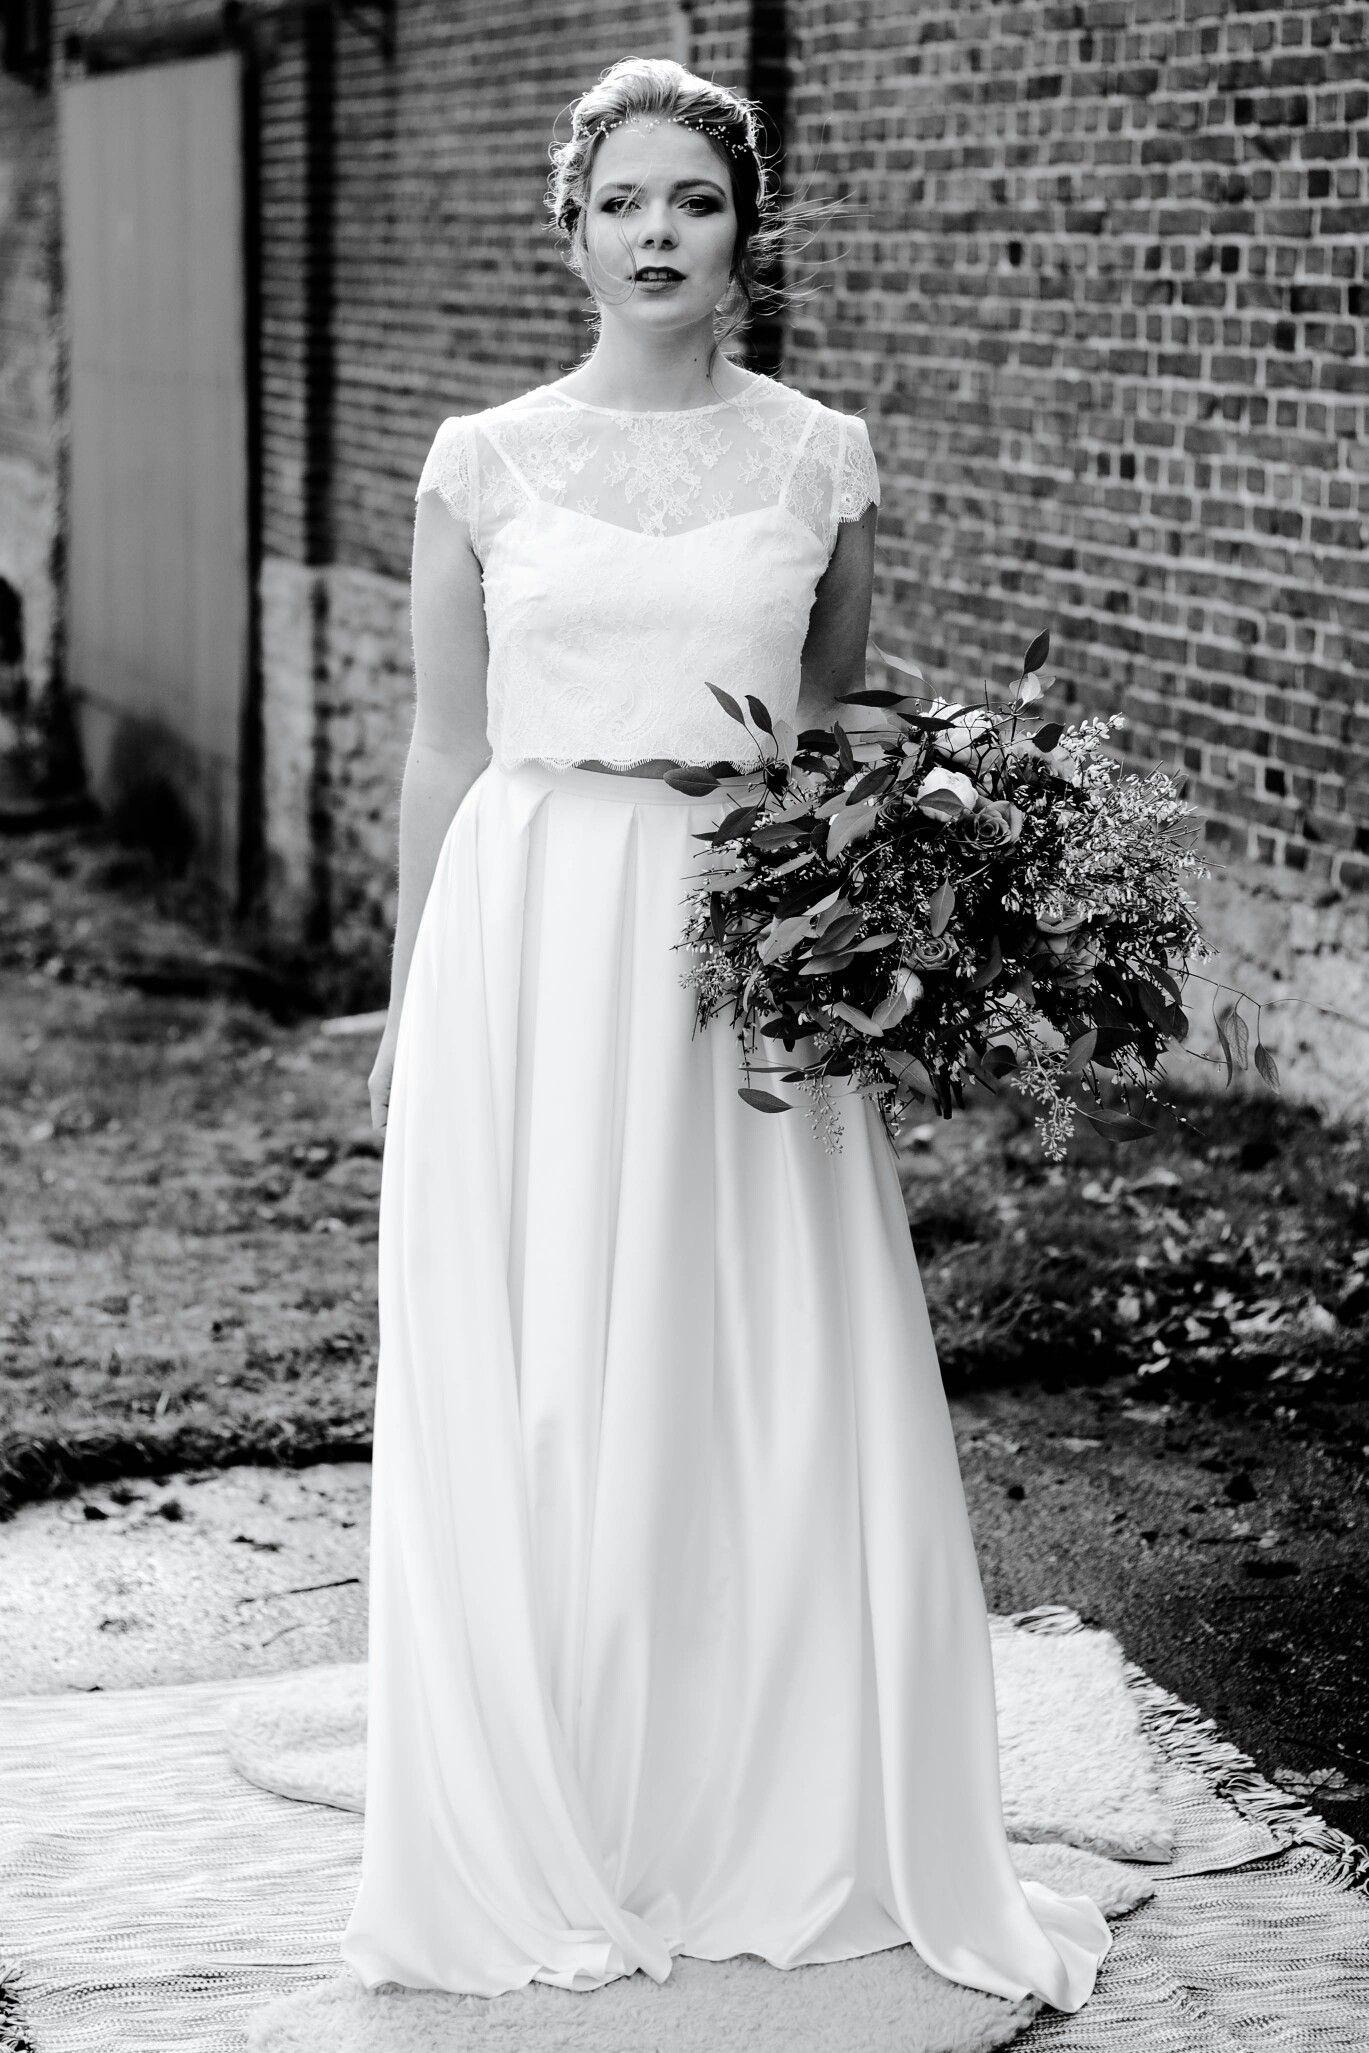 Bridal Couture by Irene Klassen. Made in Germany. #ireneklassen ...